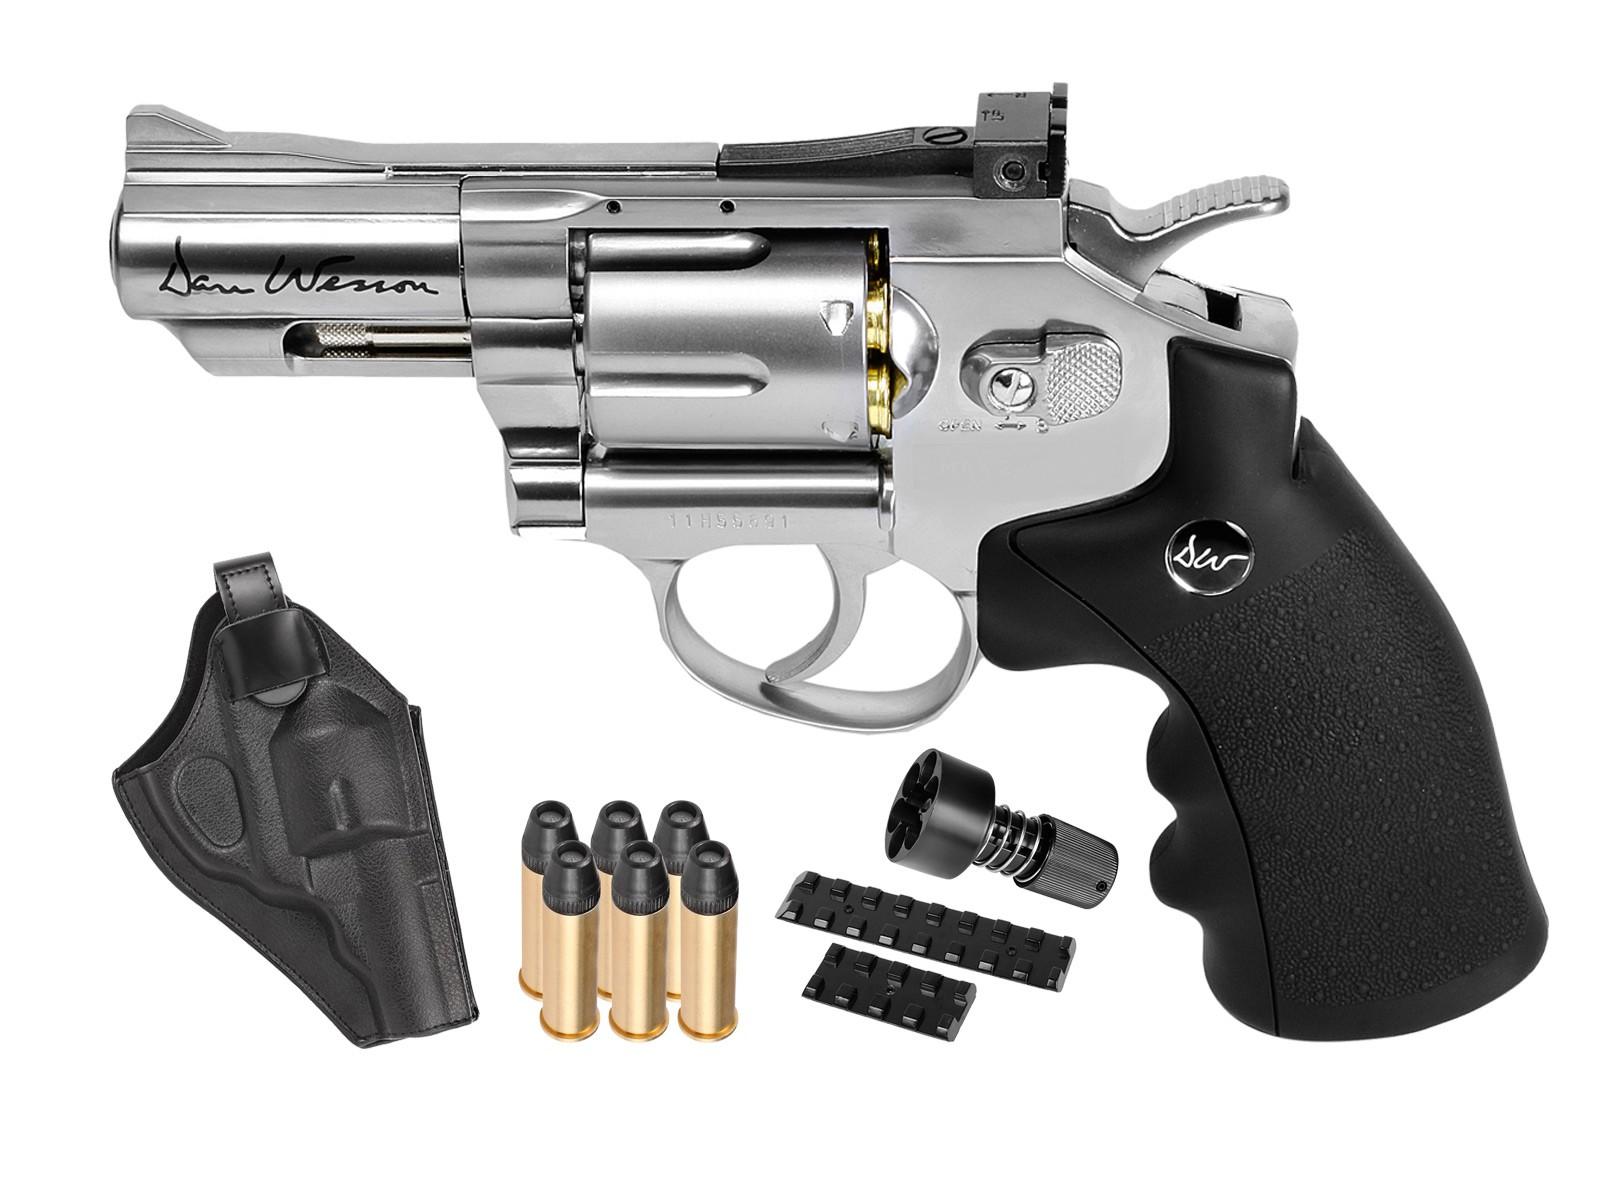 Cheap Dan Wesson 2.5″ CO2 Pellet Revolver Kit, Silver 0.177